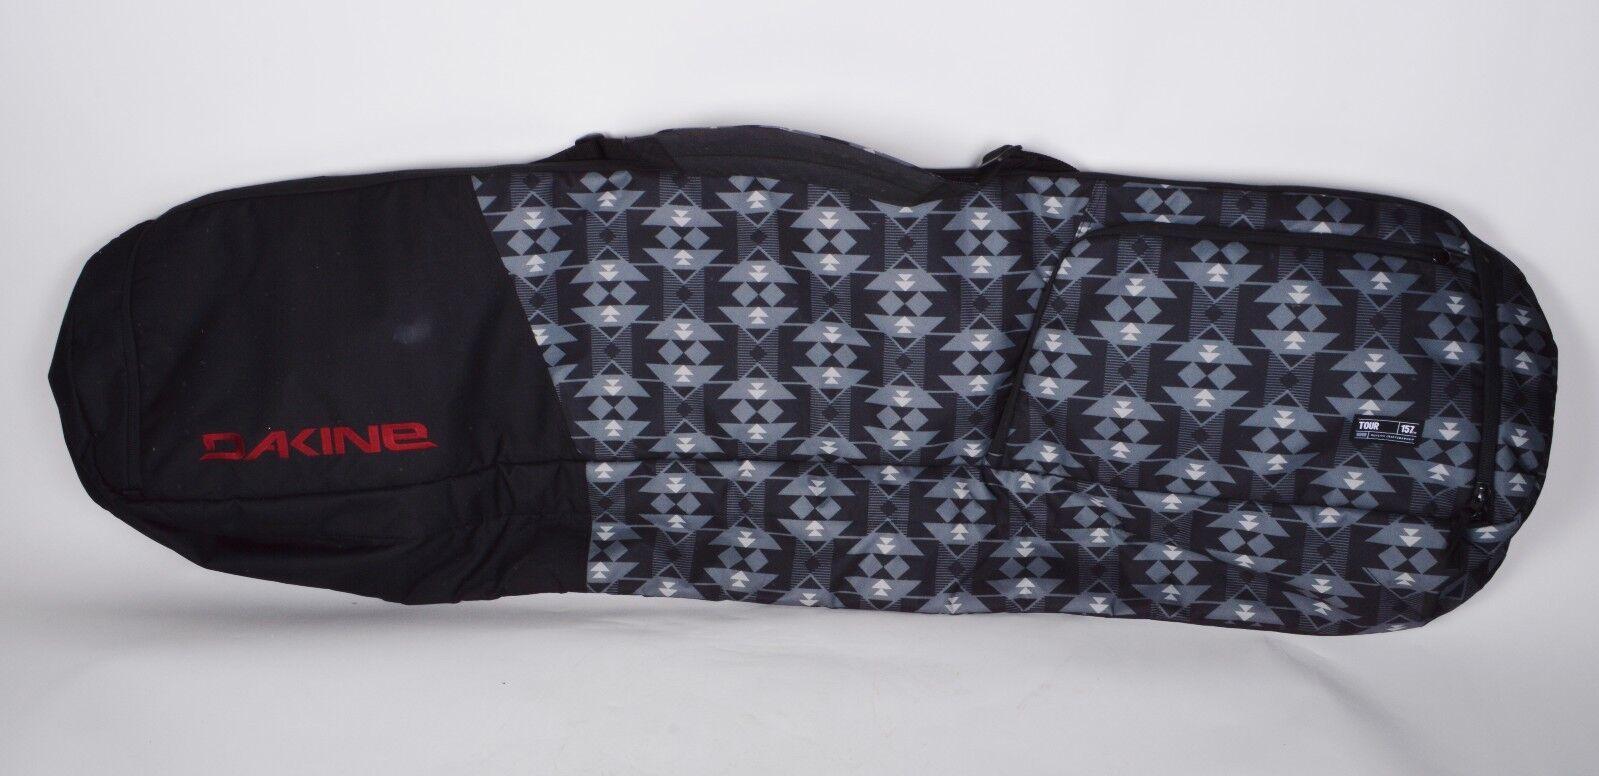 Details About Nwot Dakine Tour Snowboard Bag 90 Black Grey 157 Cm Long